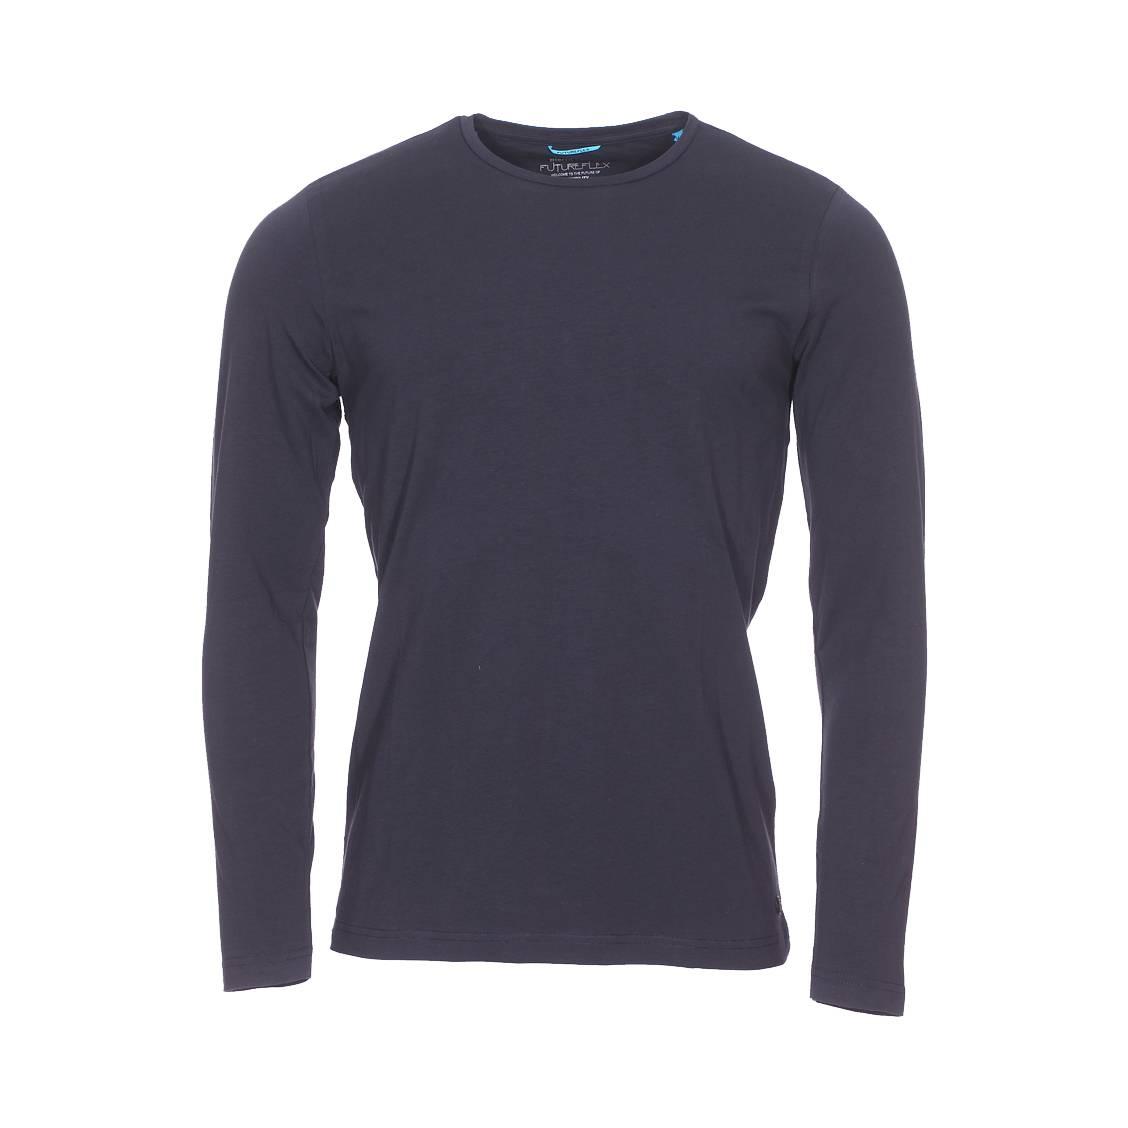 Tee-shirt col rond manches longues  en coton stretch bleu marine